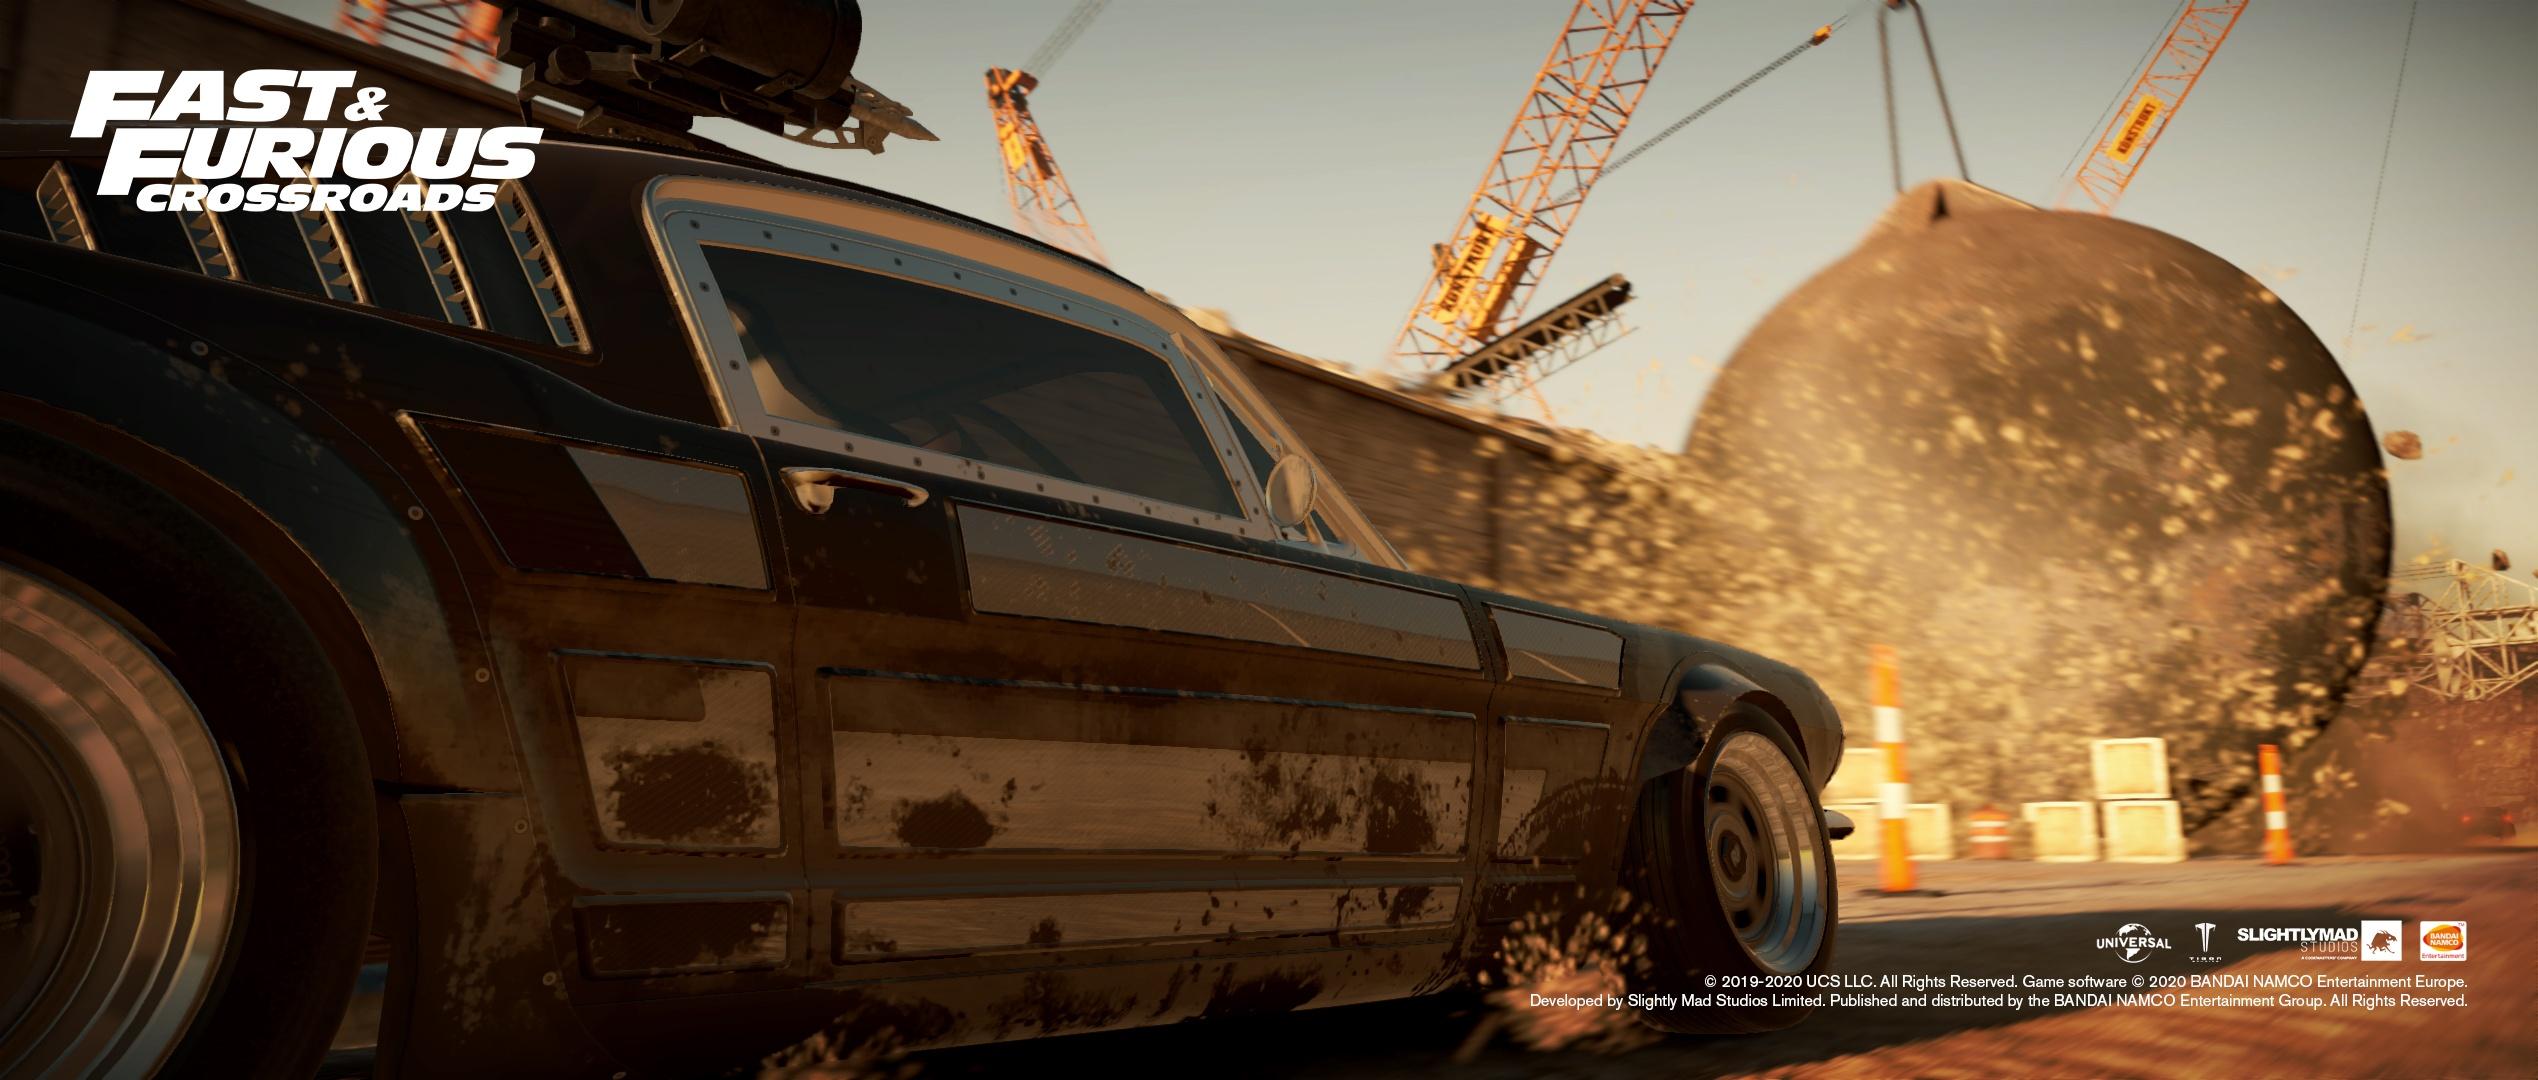 Fast Furious: Crossroads